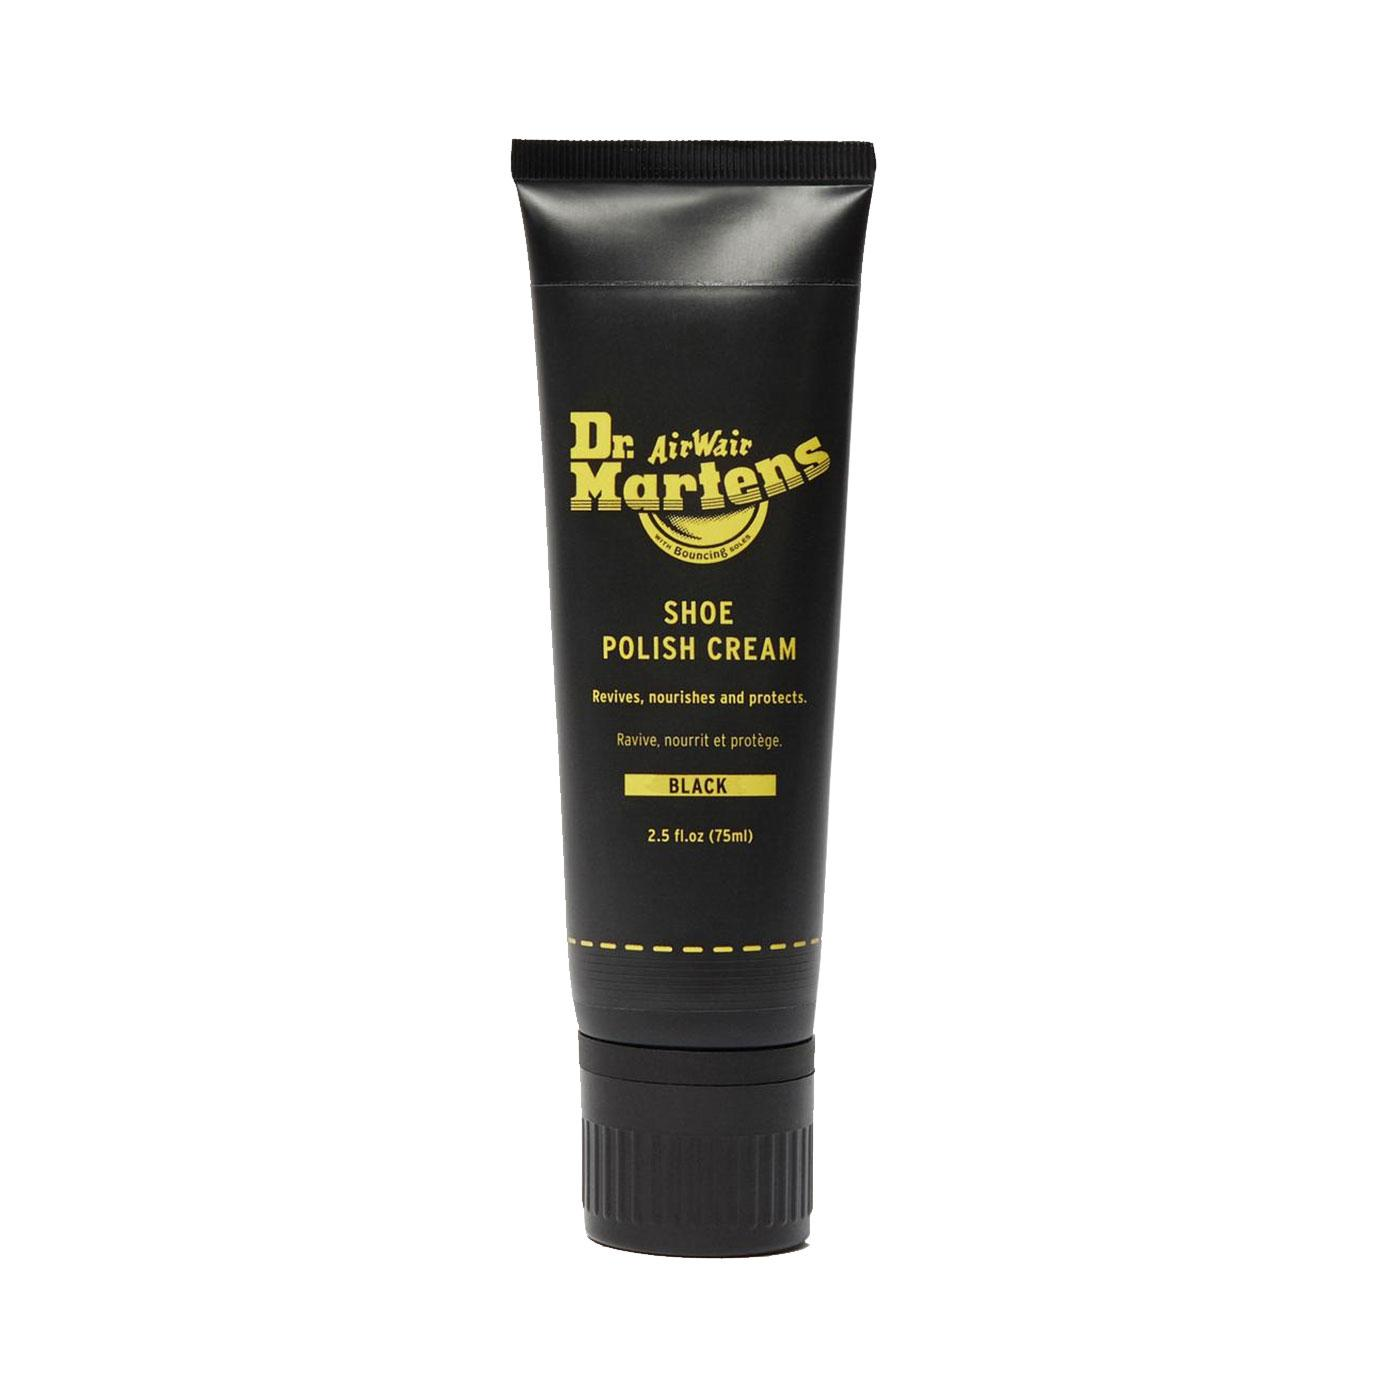 DR MARTENS 75ml Shoe Care Polish Cream (Black)